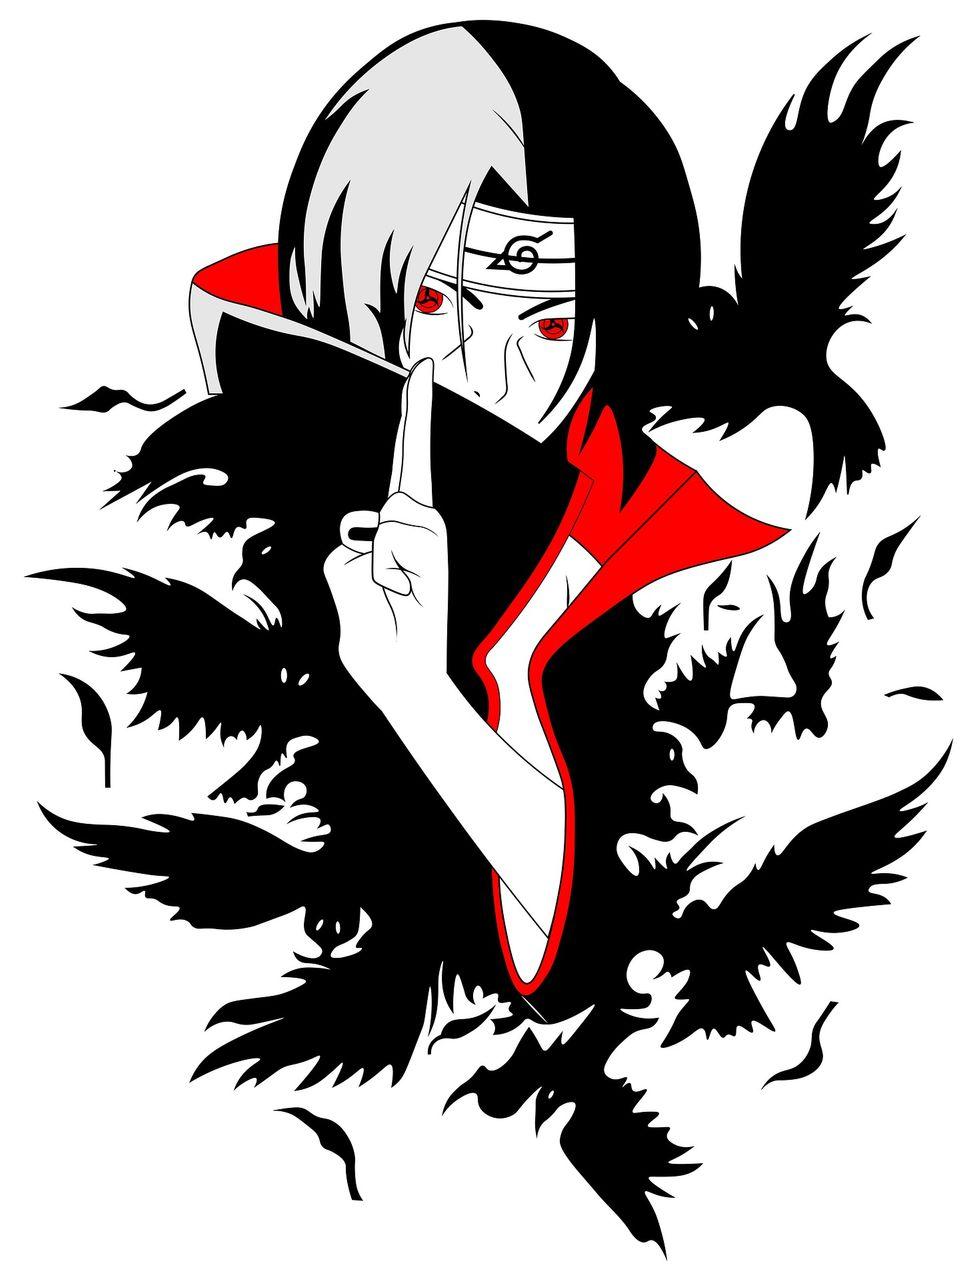 crow-6117223_1920.jpg